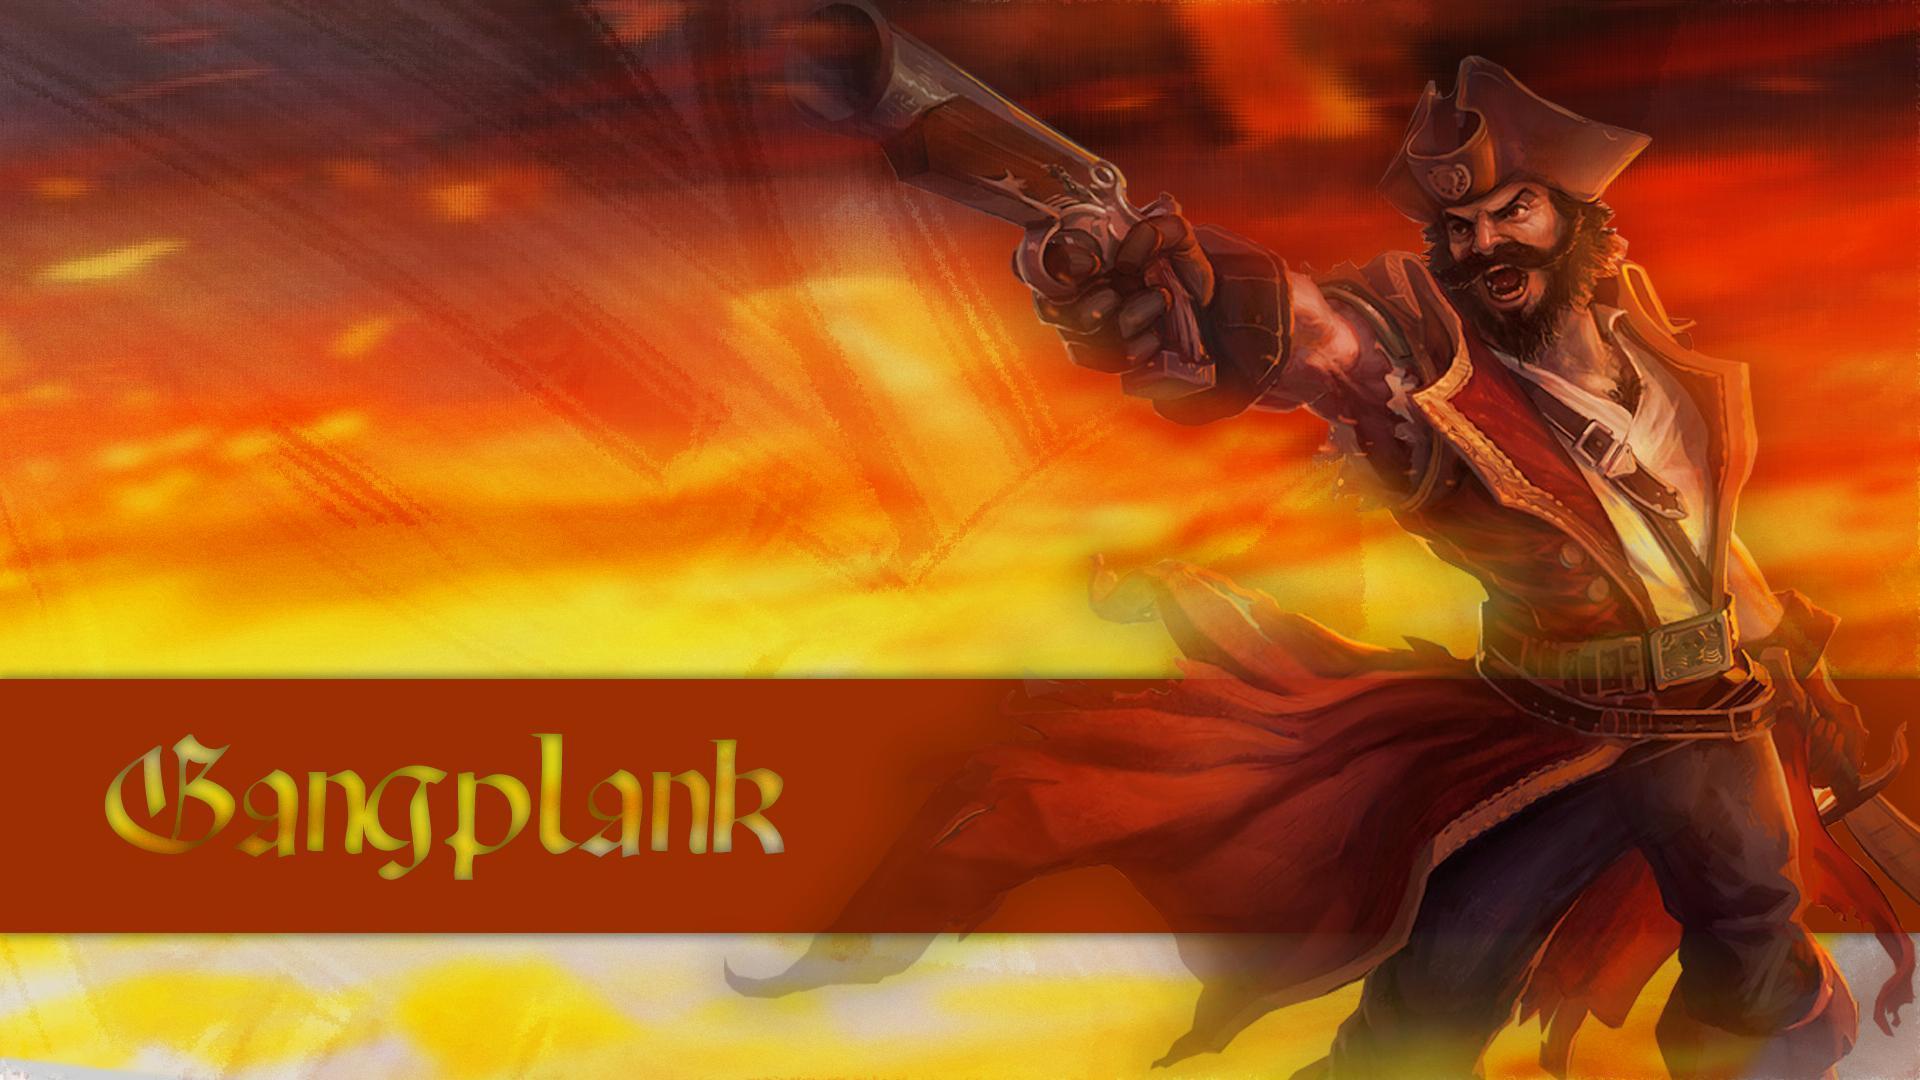 Gangplank Wallpapers, Desktop 4K Full HD Pics, GuoGuiyan Wallpapers